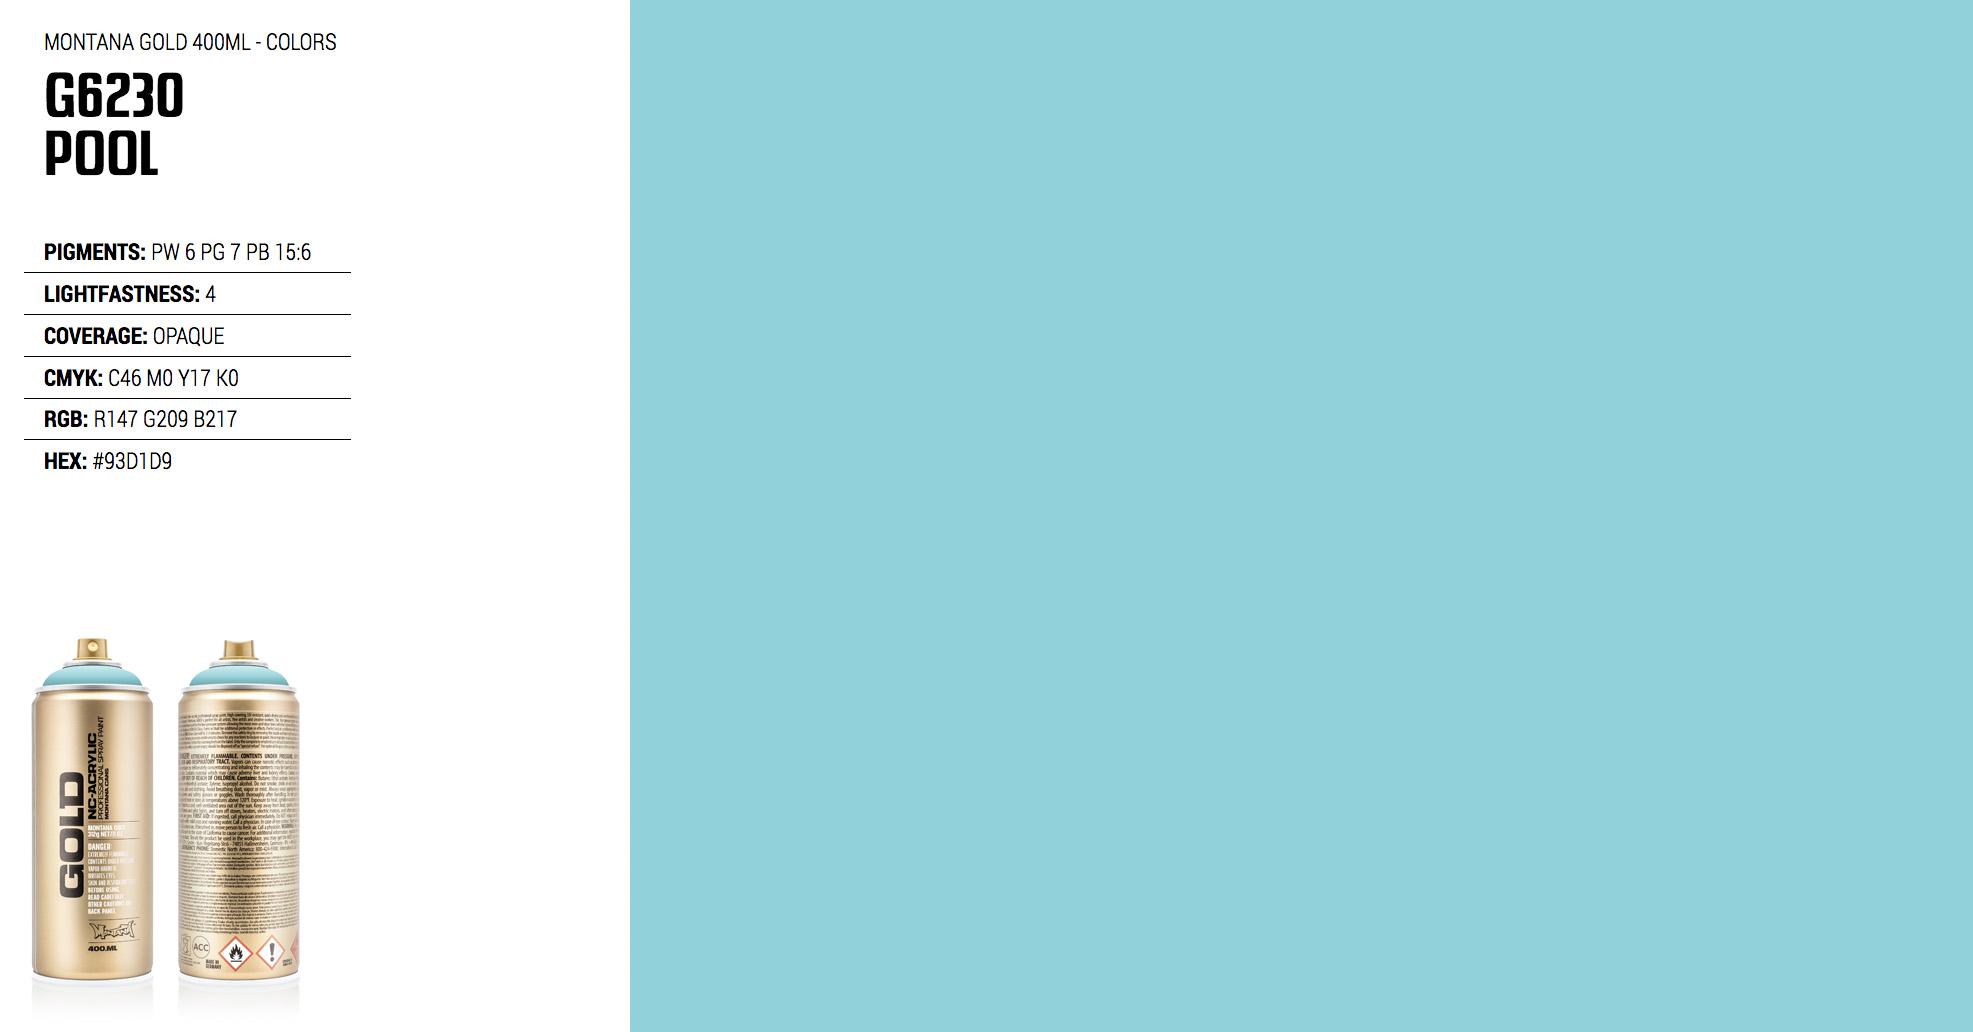 montana gold color g6230 pool montana cans blog. Black Bedroom Furniture Sets. Home Design Ideas